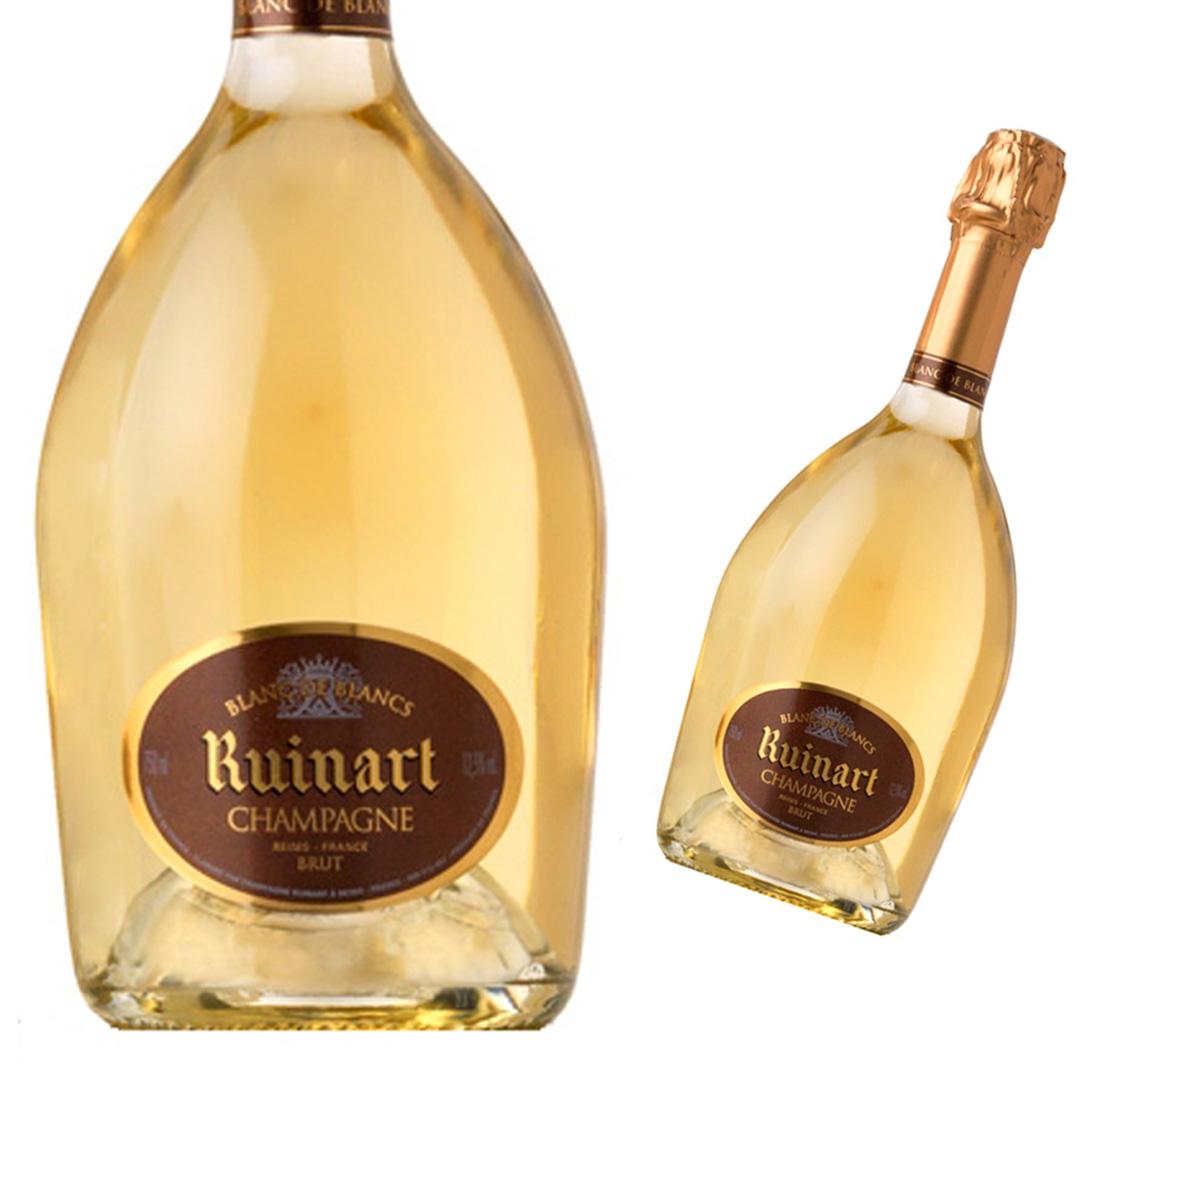 Blanc de Blancs Ruinart Champagne Champagne Ruinart Blanc de